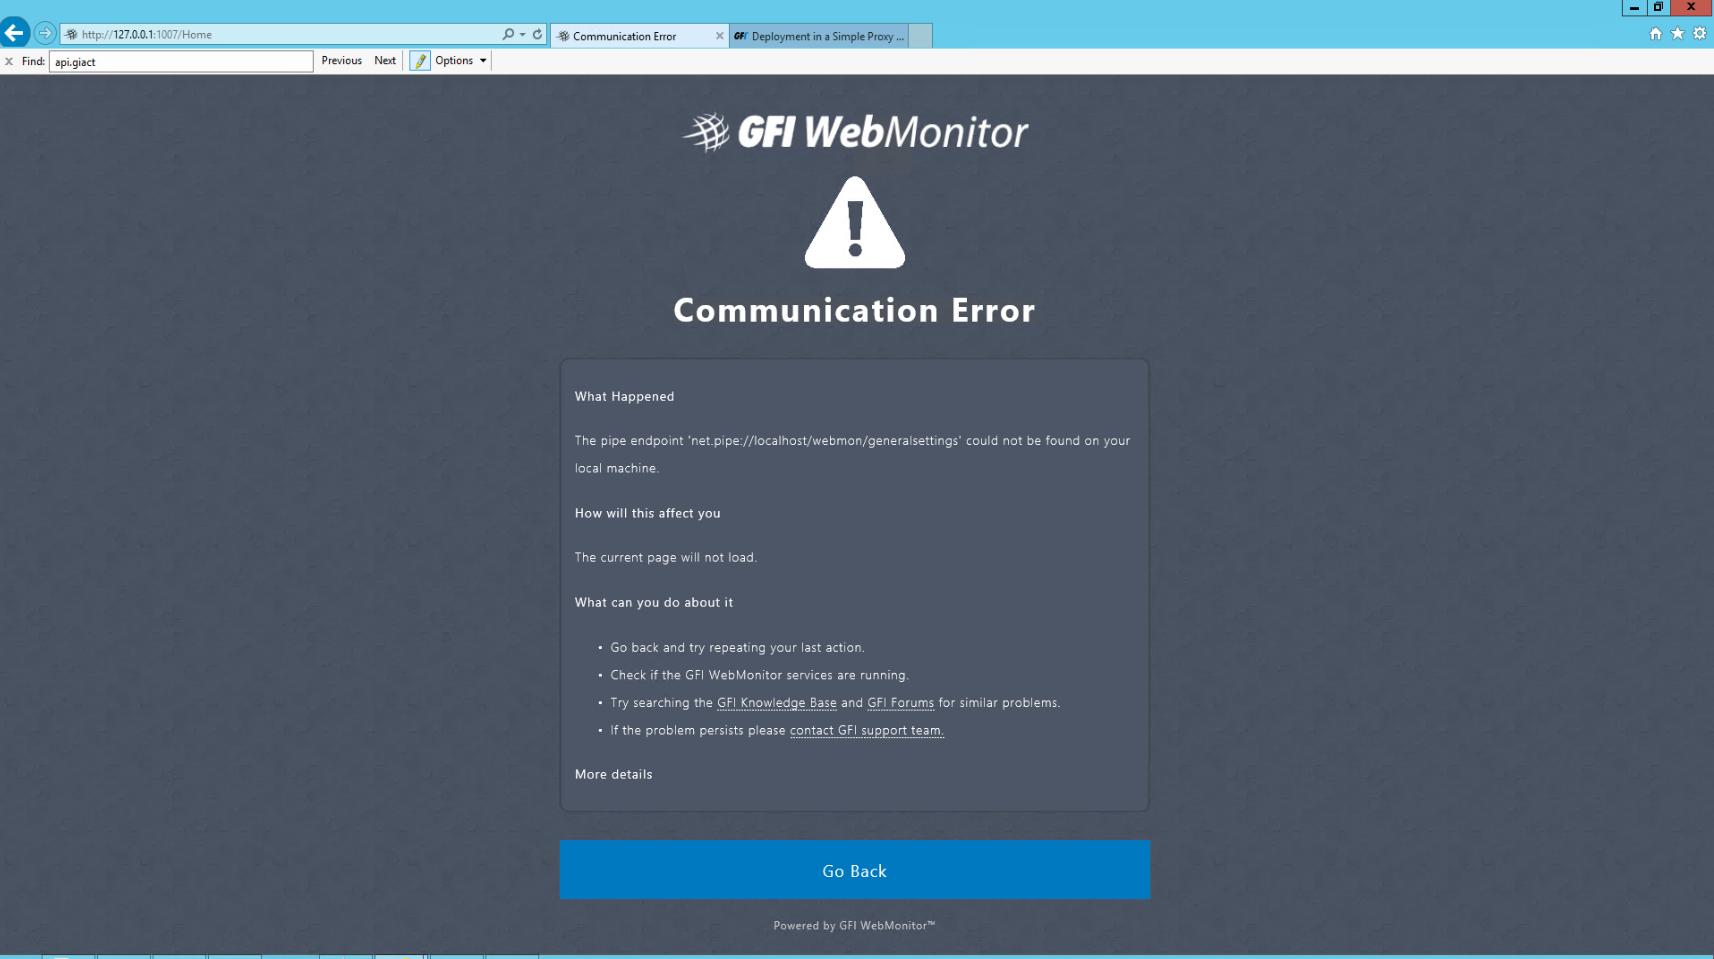 WebMonitor - Communication error